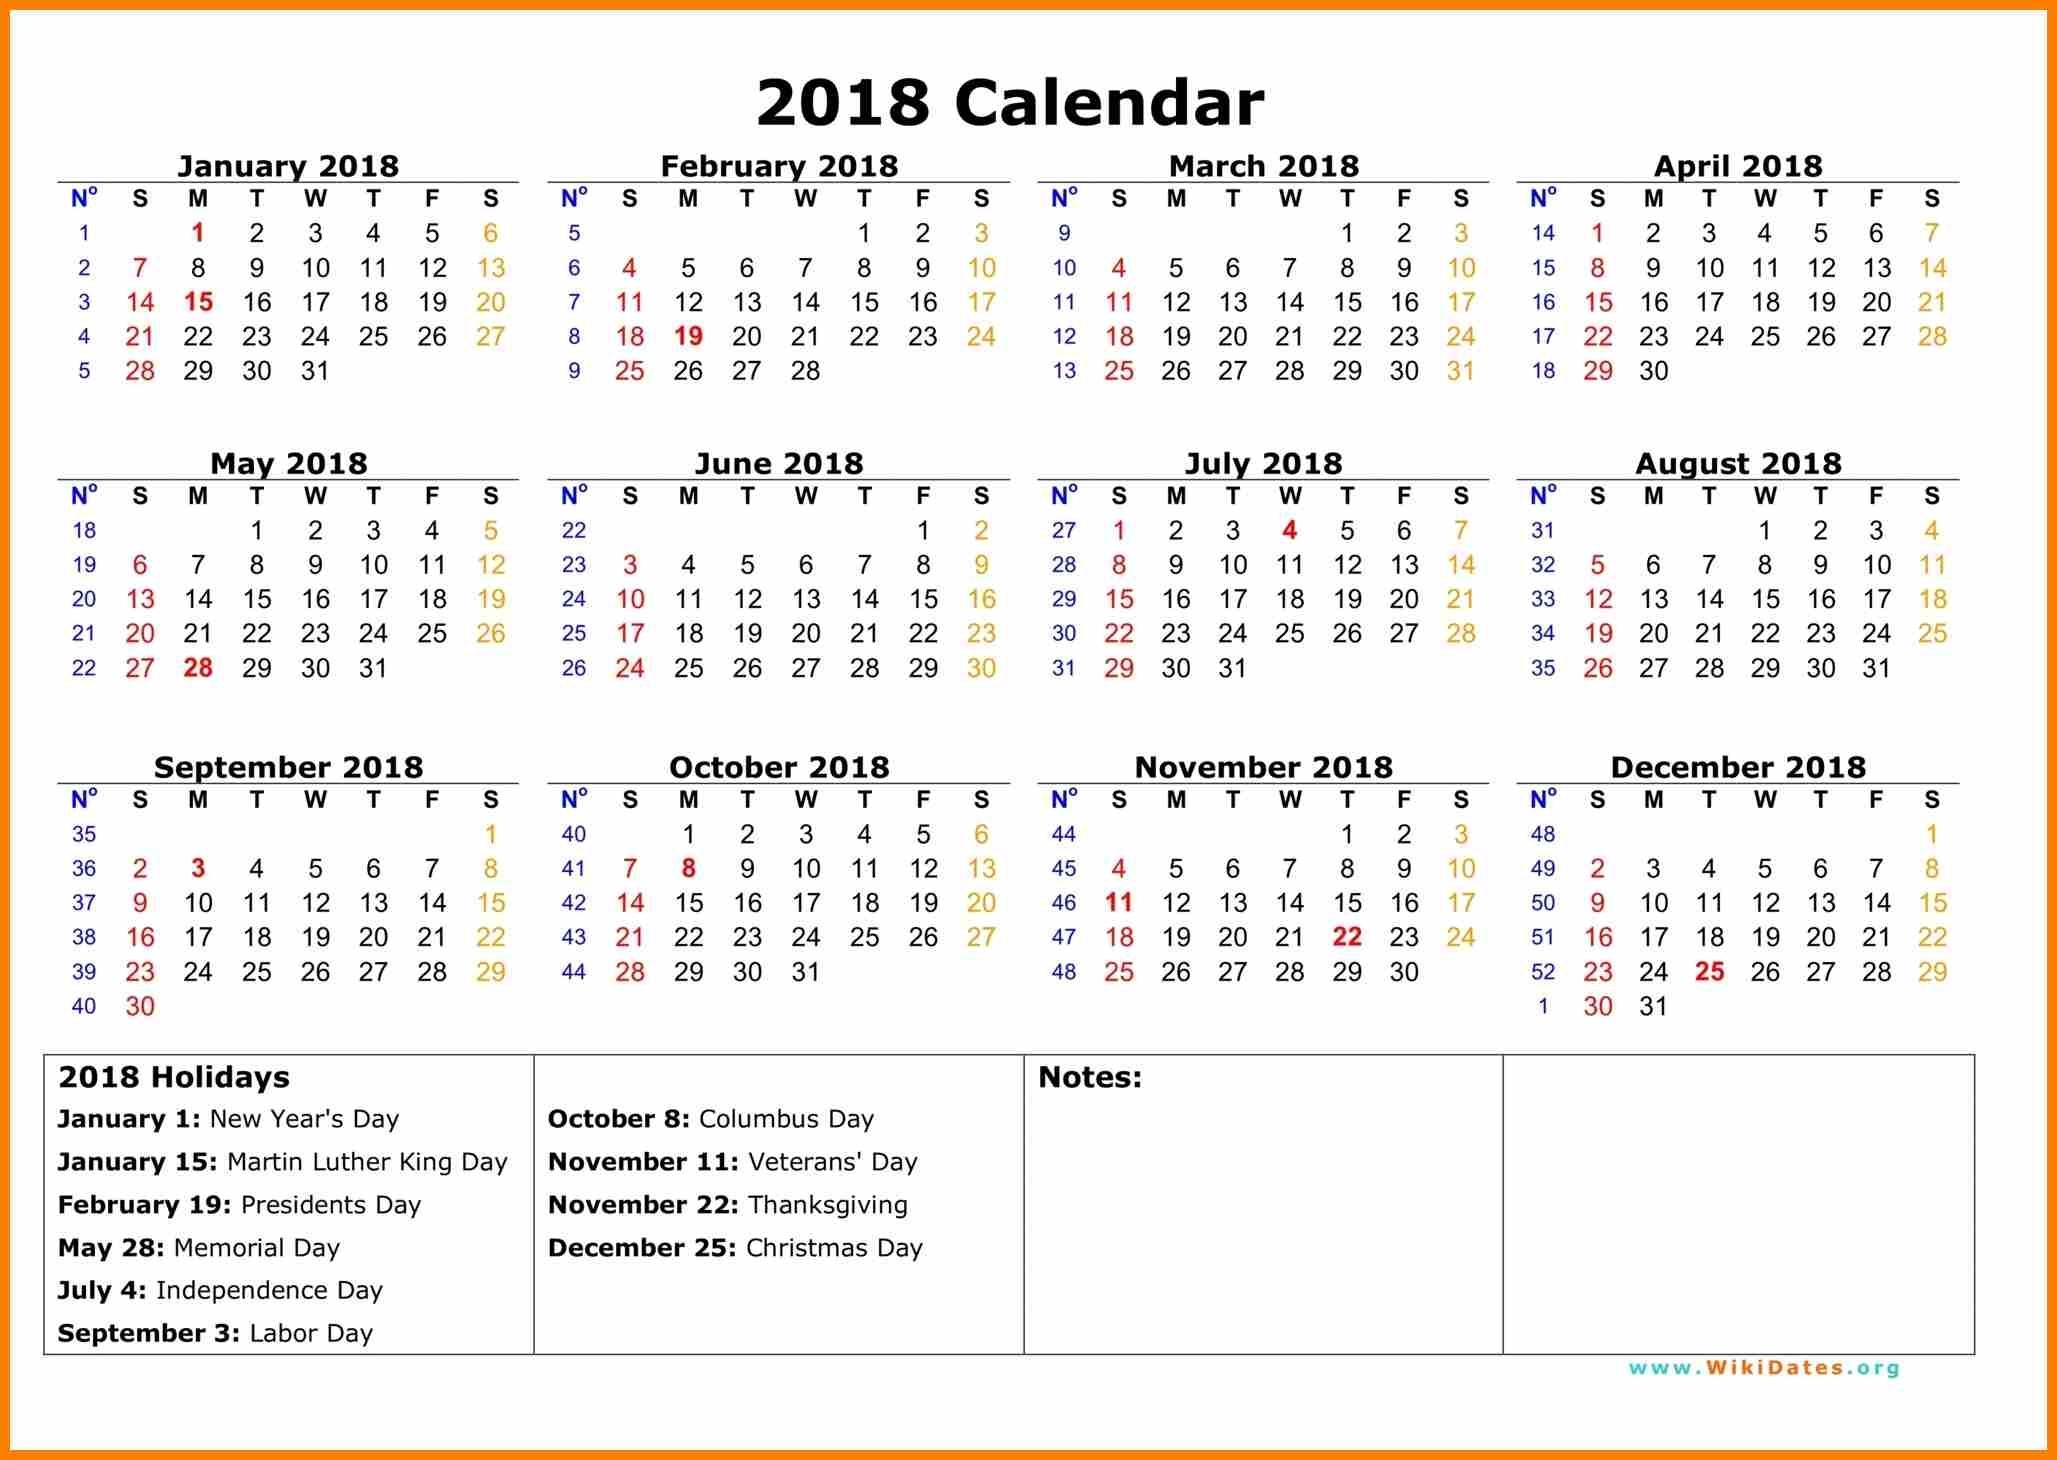 calendar 2018 india printable free download usa ripping  2018 Calendar With Holidays Usa Printable erdferdf